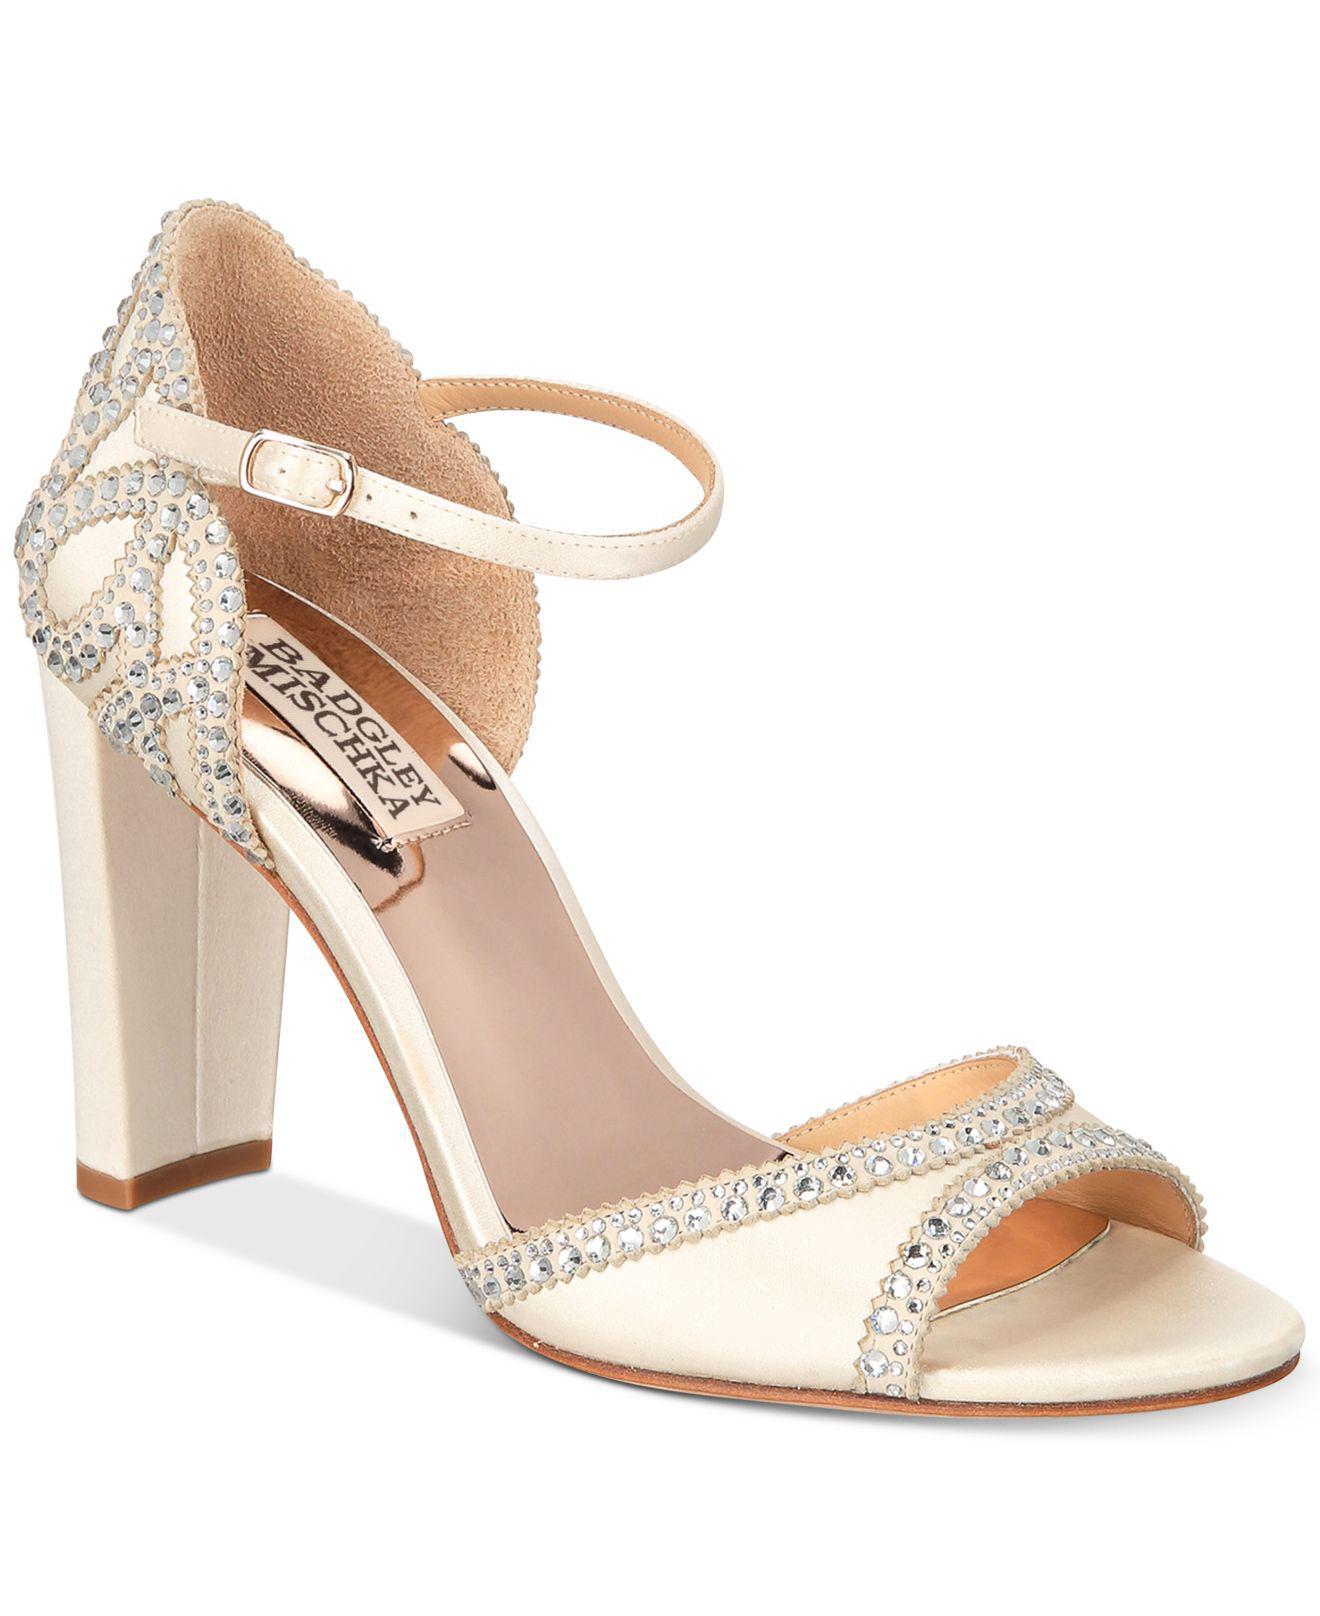 Lyst - Badgley Mischka Kelly Embelished Block-heel Evening Sandals